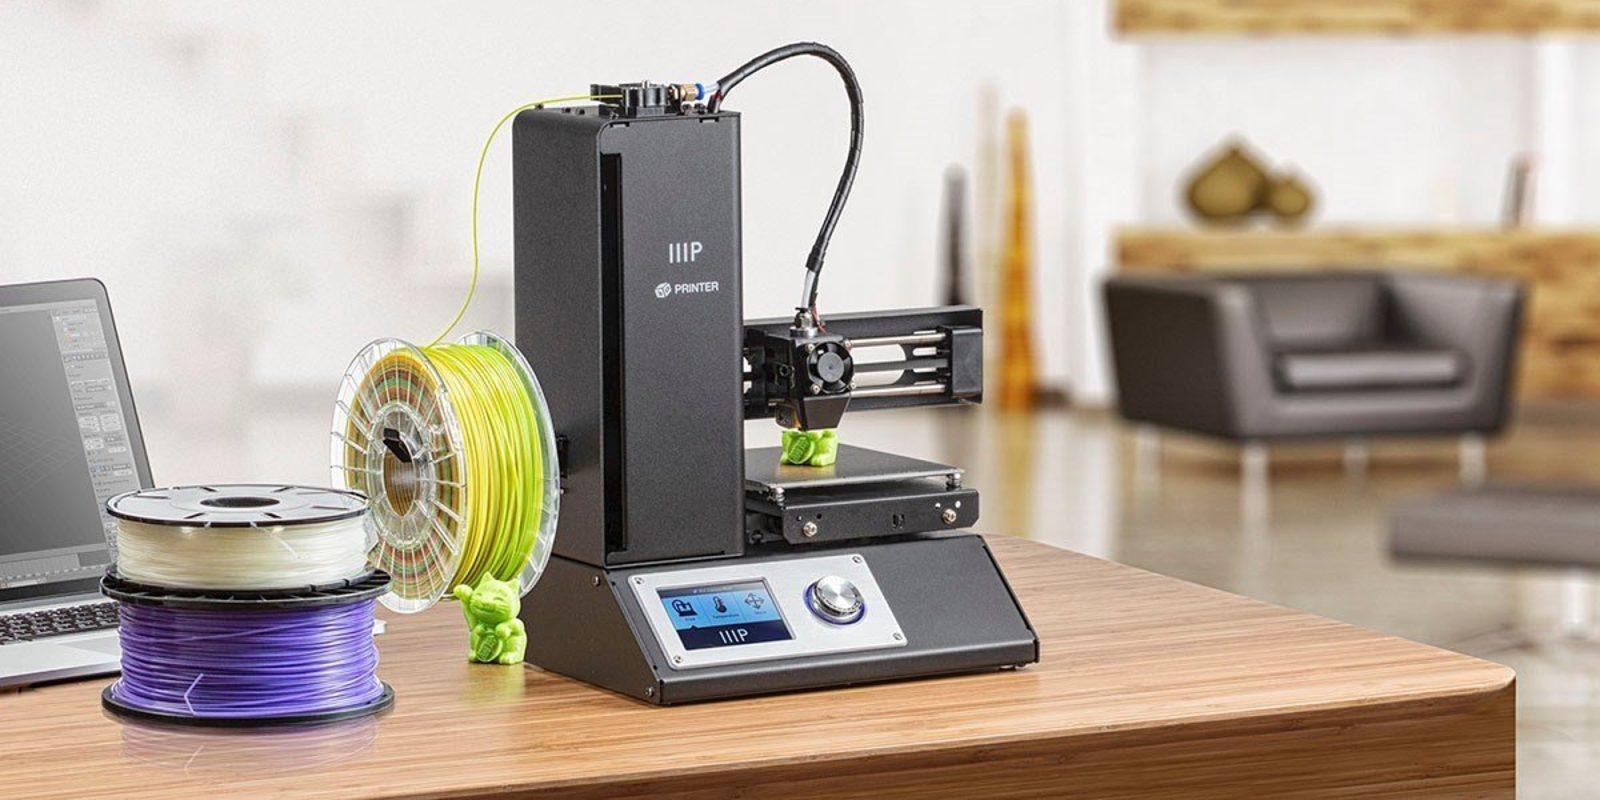 Start 3D printing for $187 w/ Monoprice's Select Mini (Reg. $220)